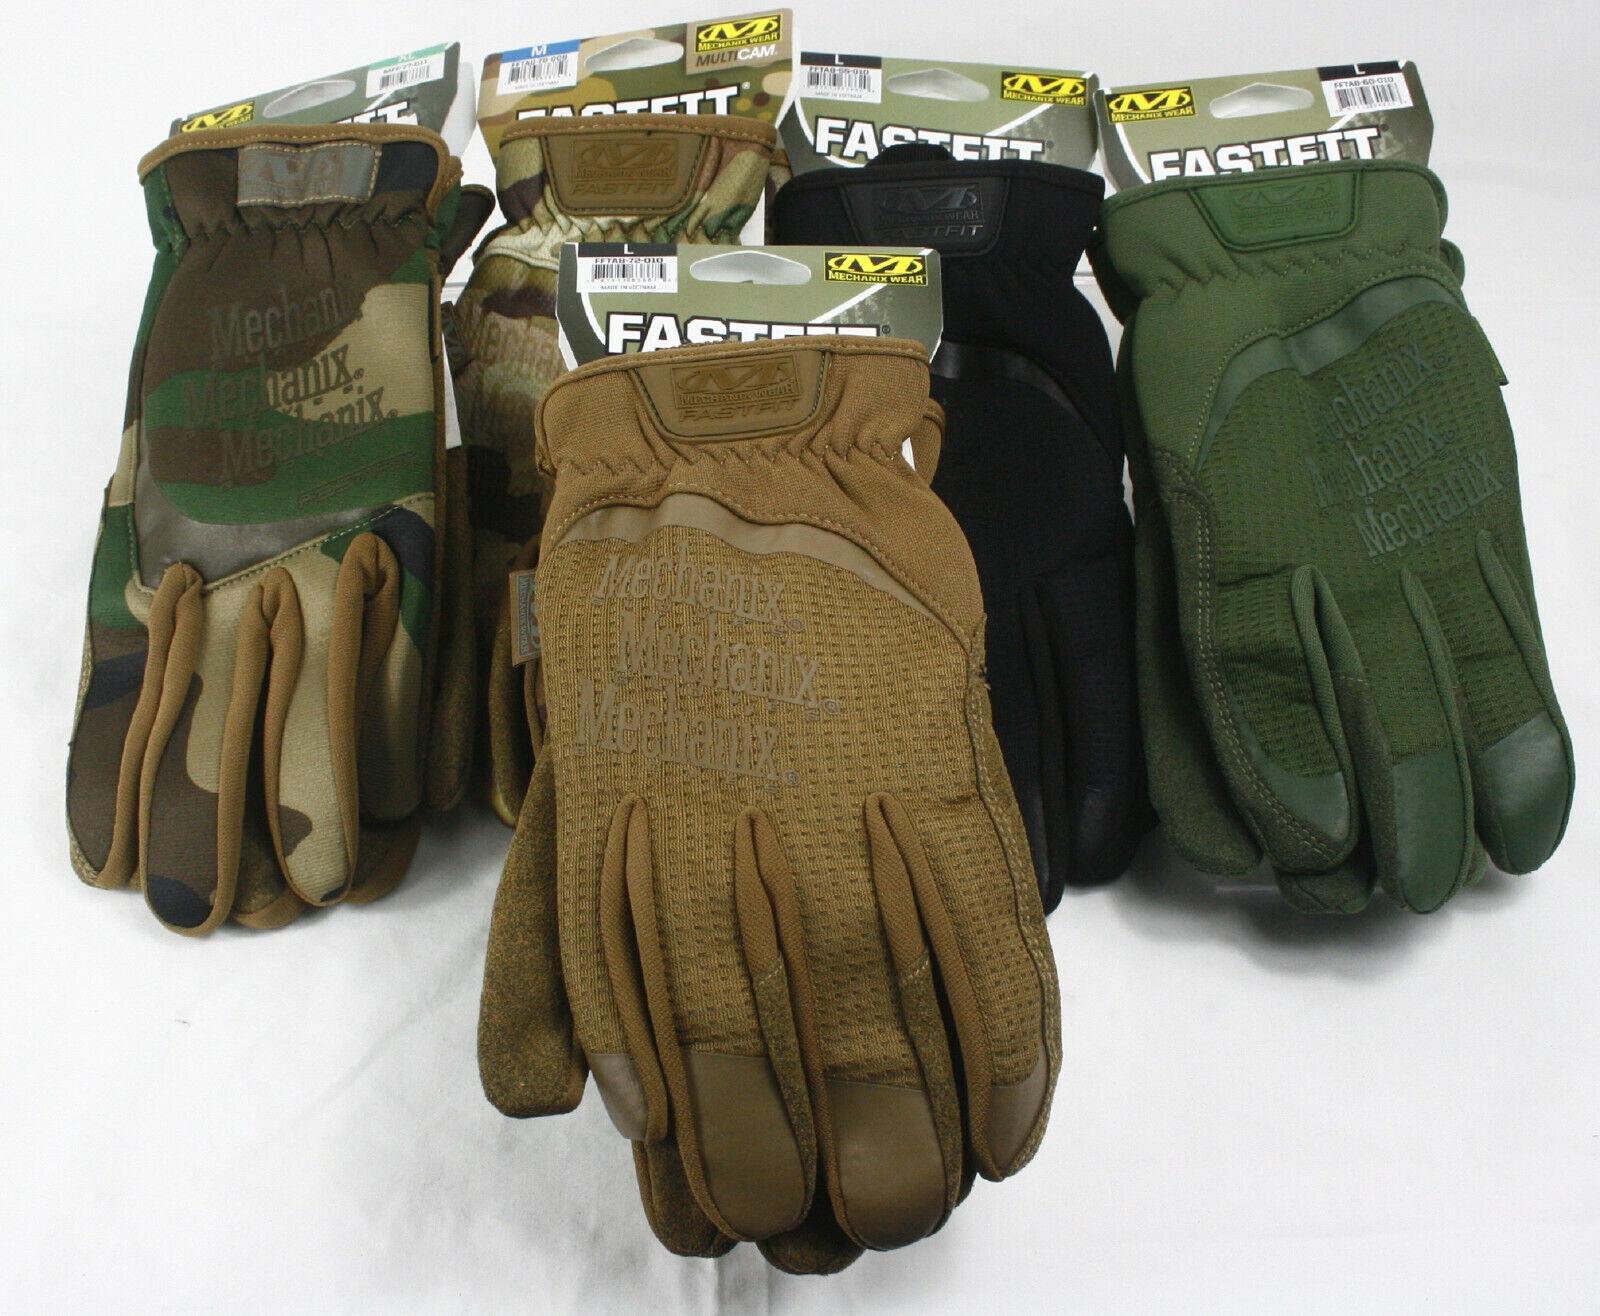 Airsoft tactical mechanix wear ® fastfit gloves ® Gen 2 multicam ® coyote